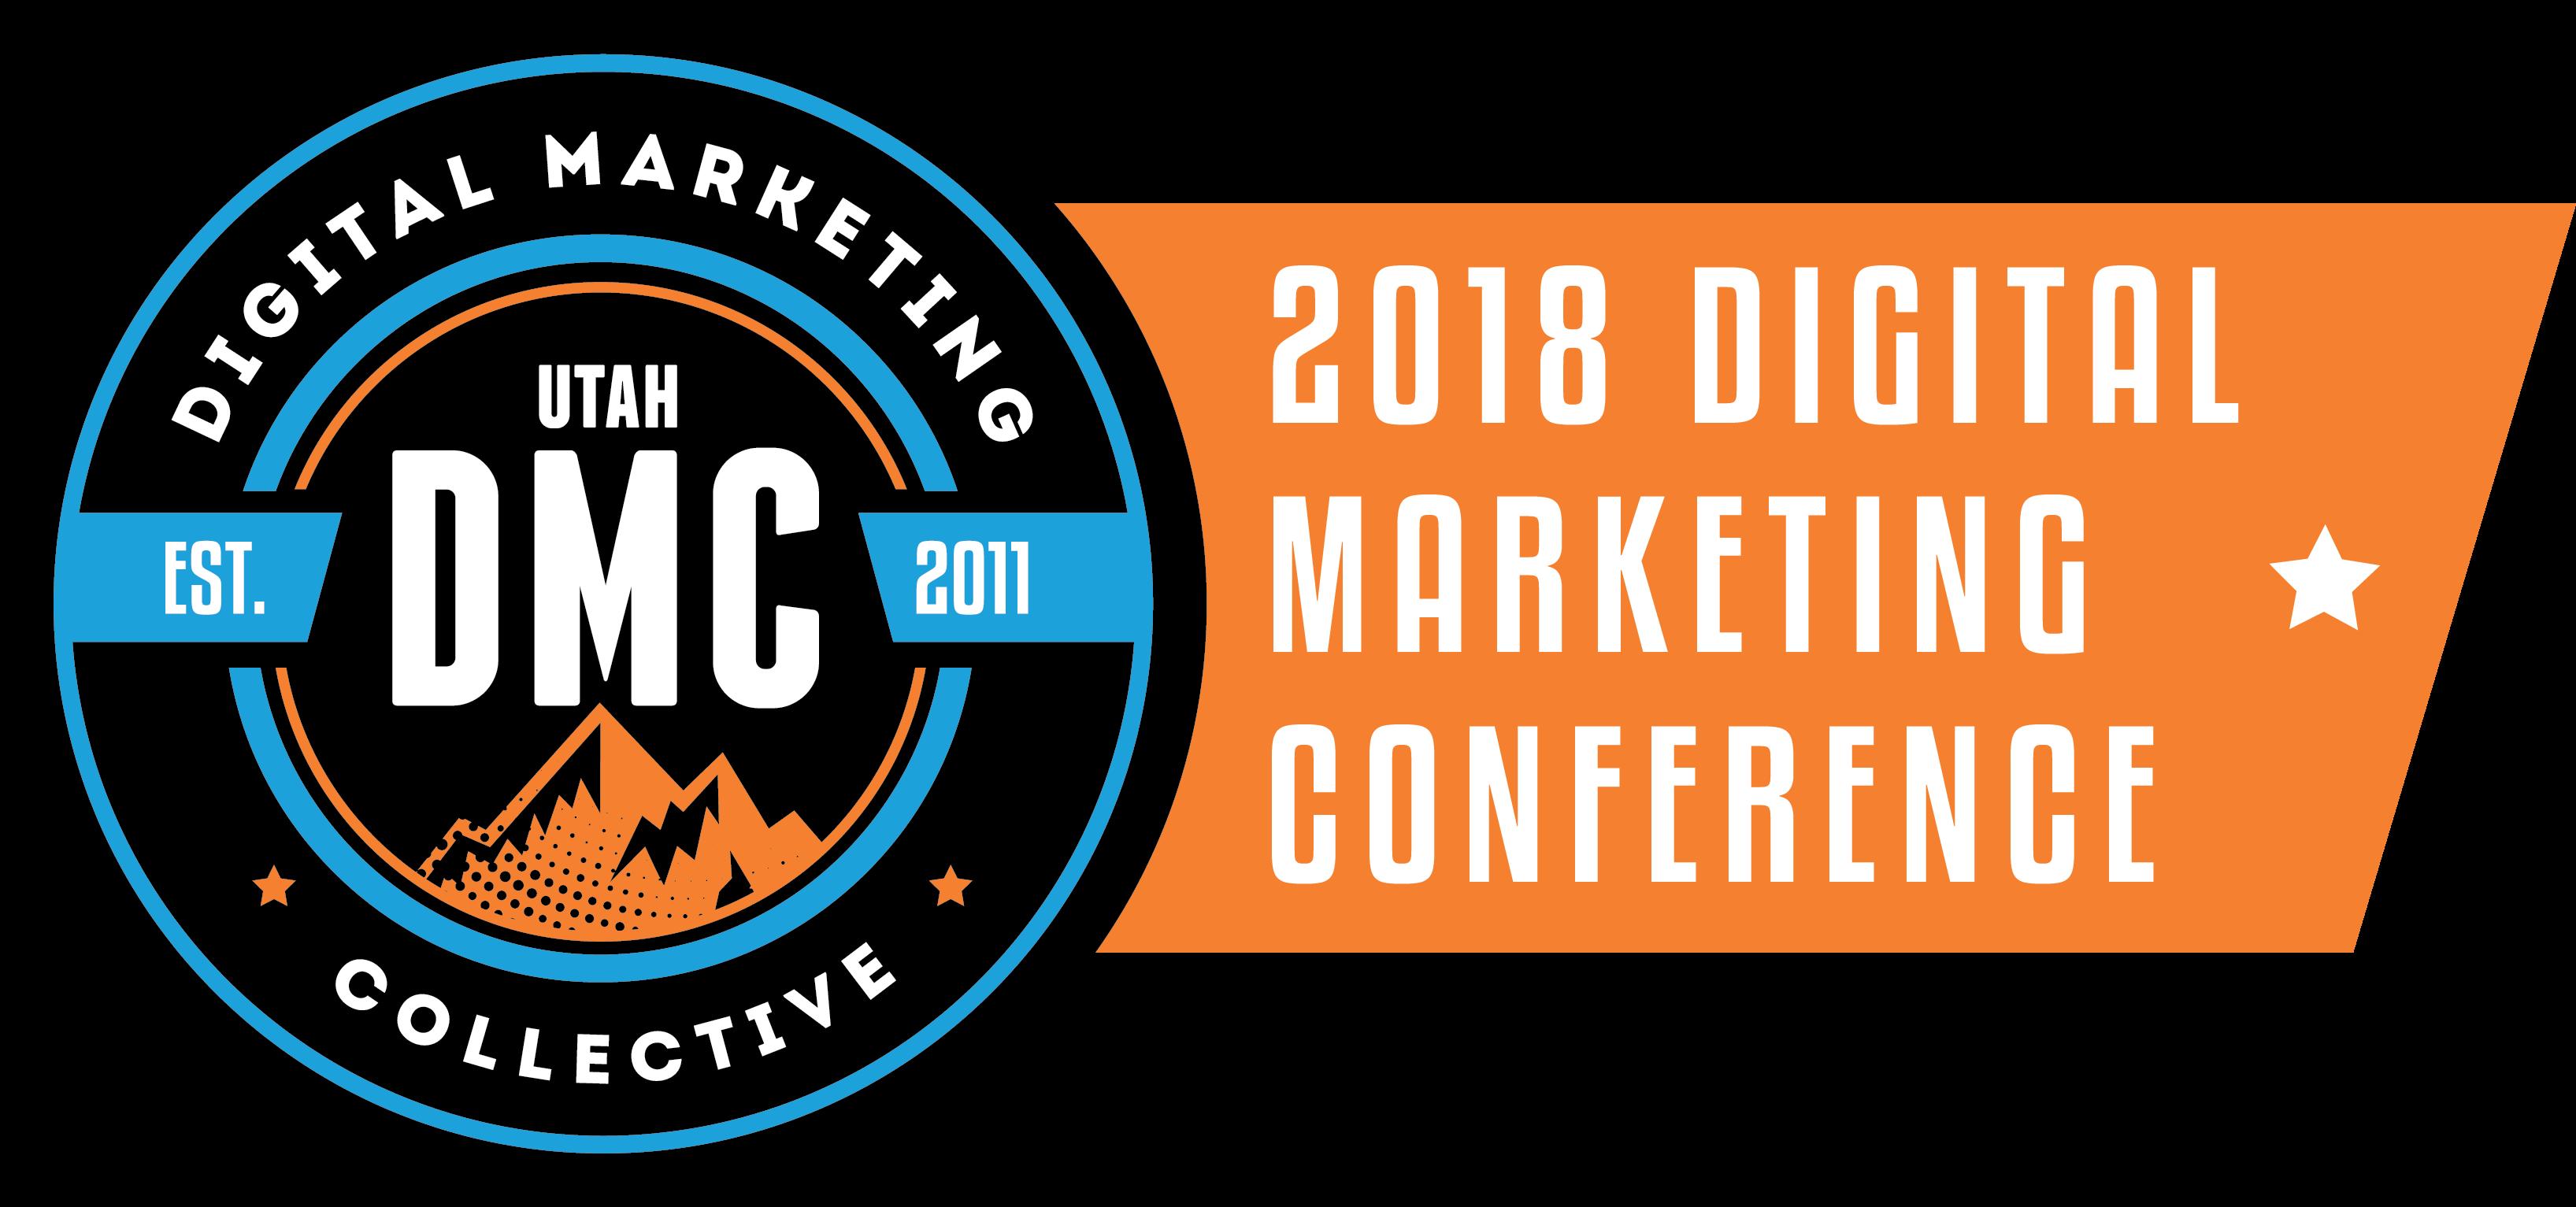 Utah DMC Digital Marketing Conference 2018